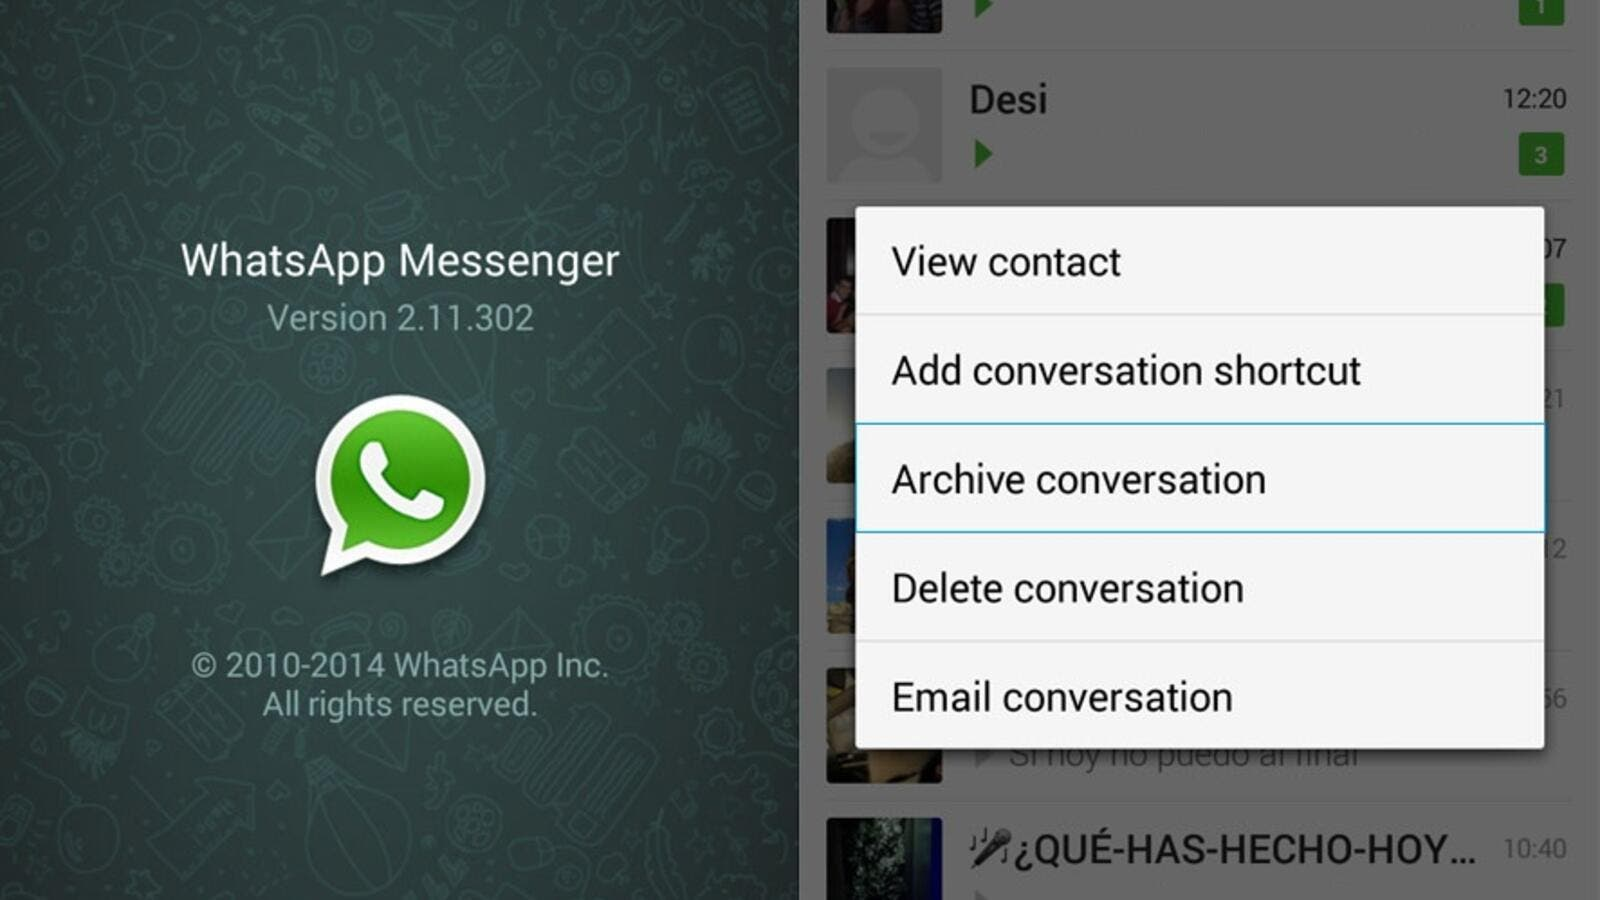 WhatsApp Video, Audio Calls Now Available in UAE   Al Bawaba